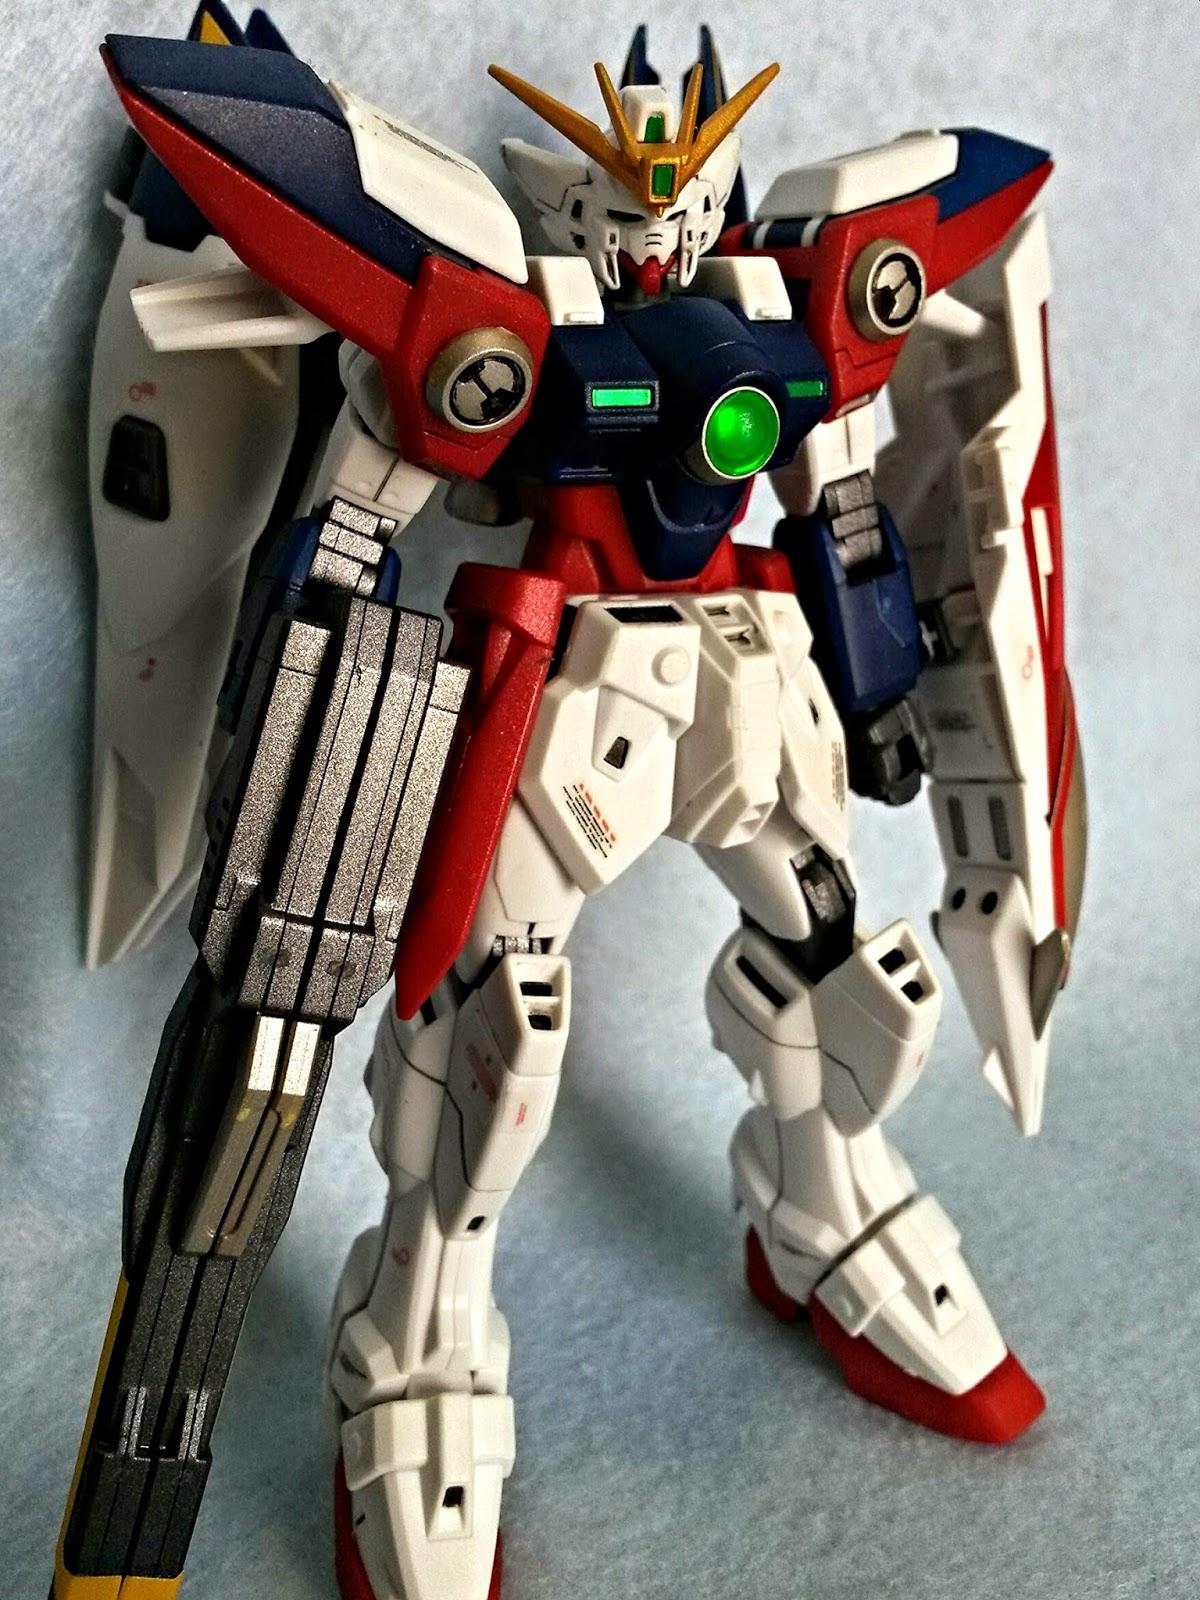 Gunplanerd Kit Insight Hgac 1 144 Xxxg 00w0 Wing Gundam Zero Painted Build